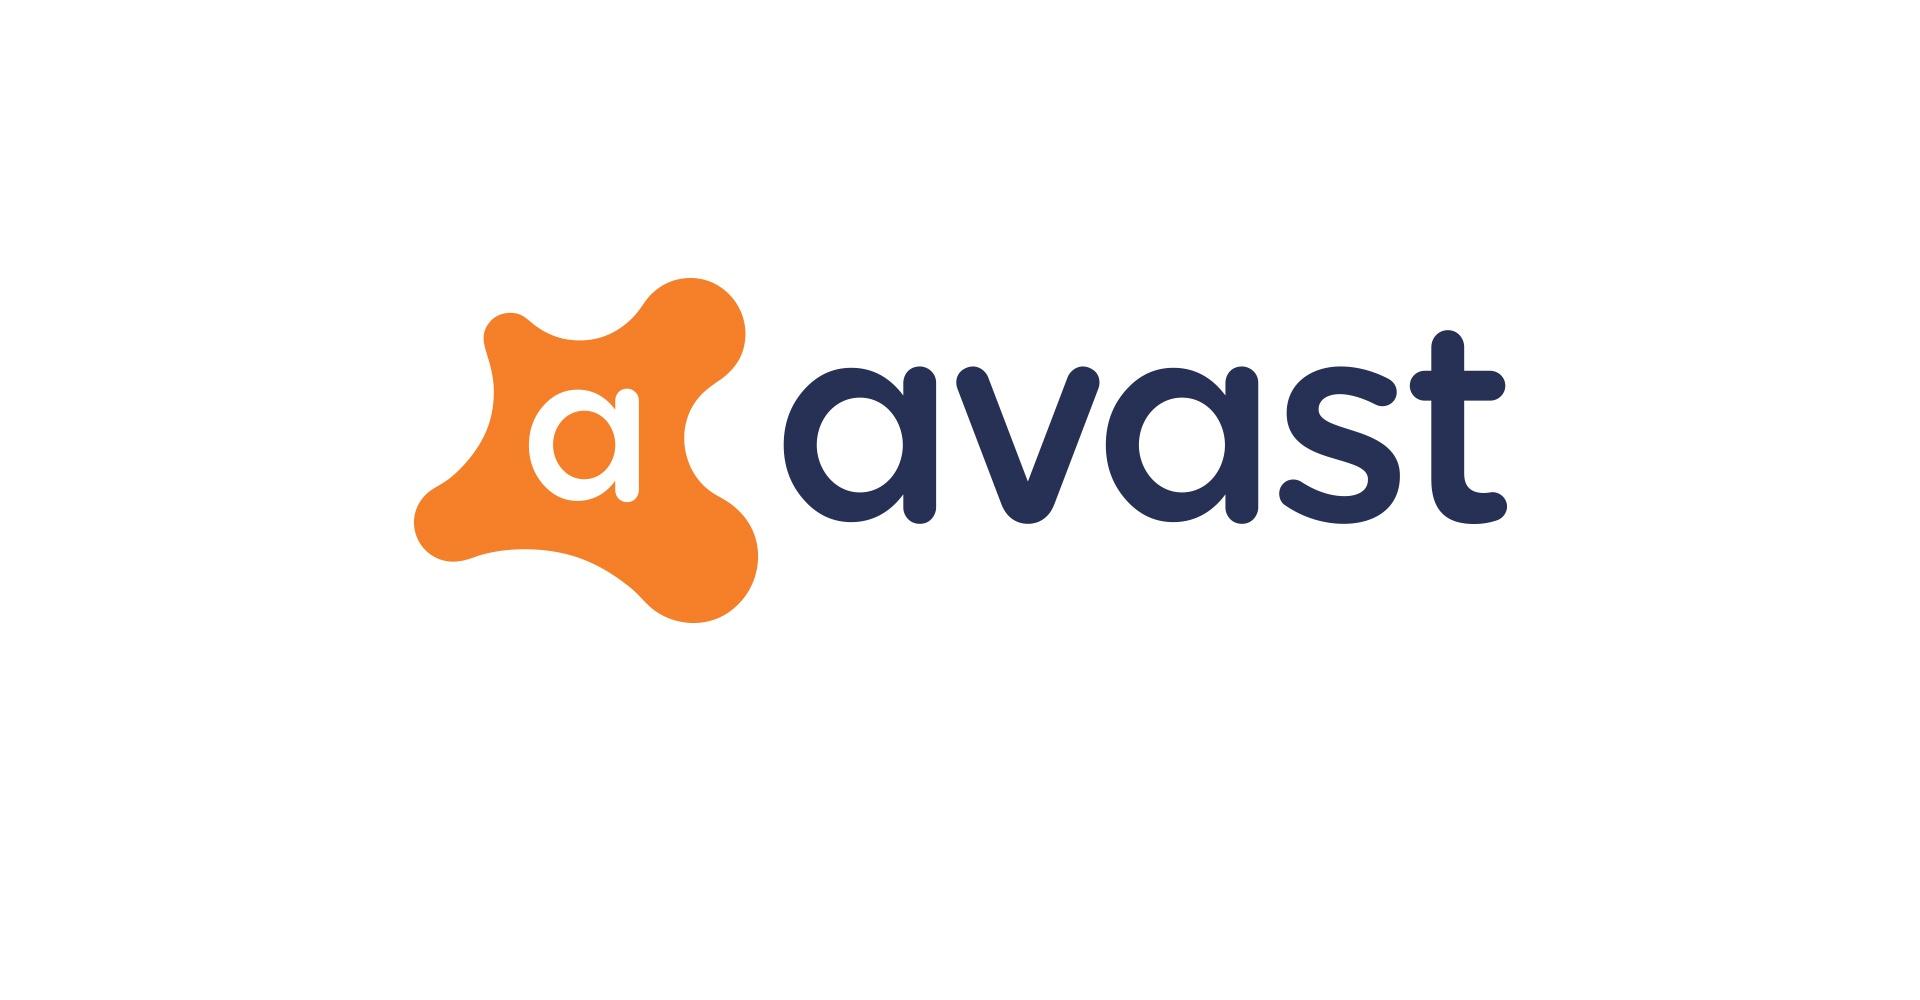 The New Avast Brand